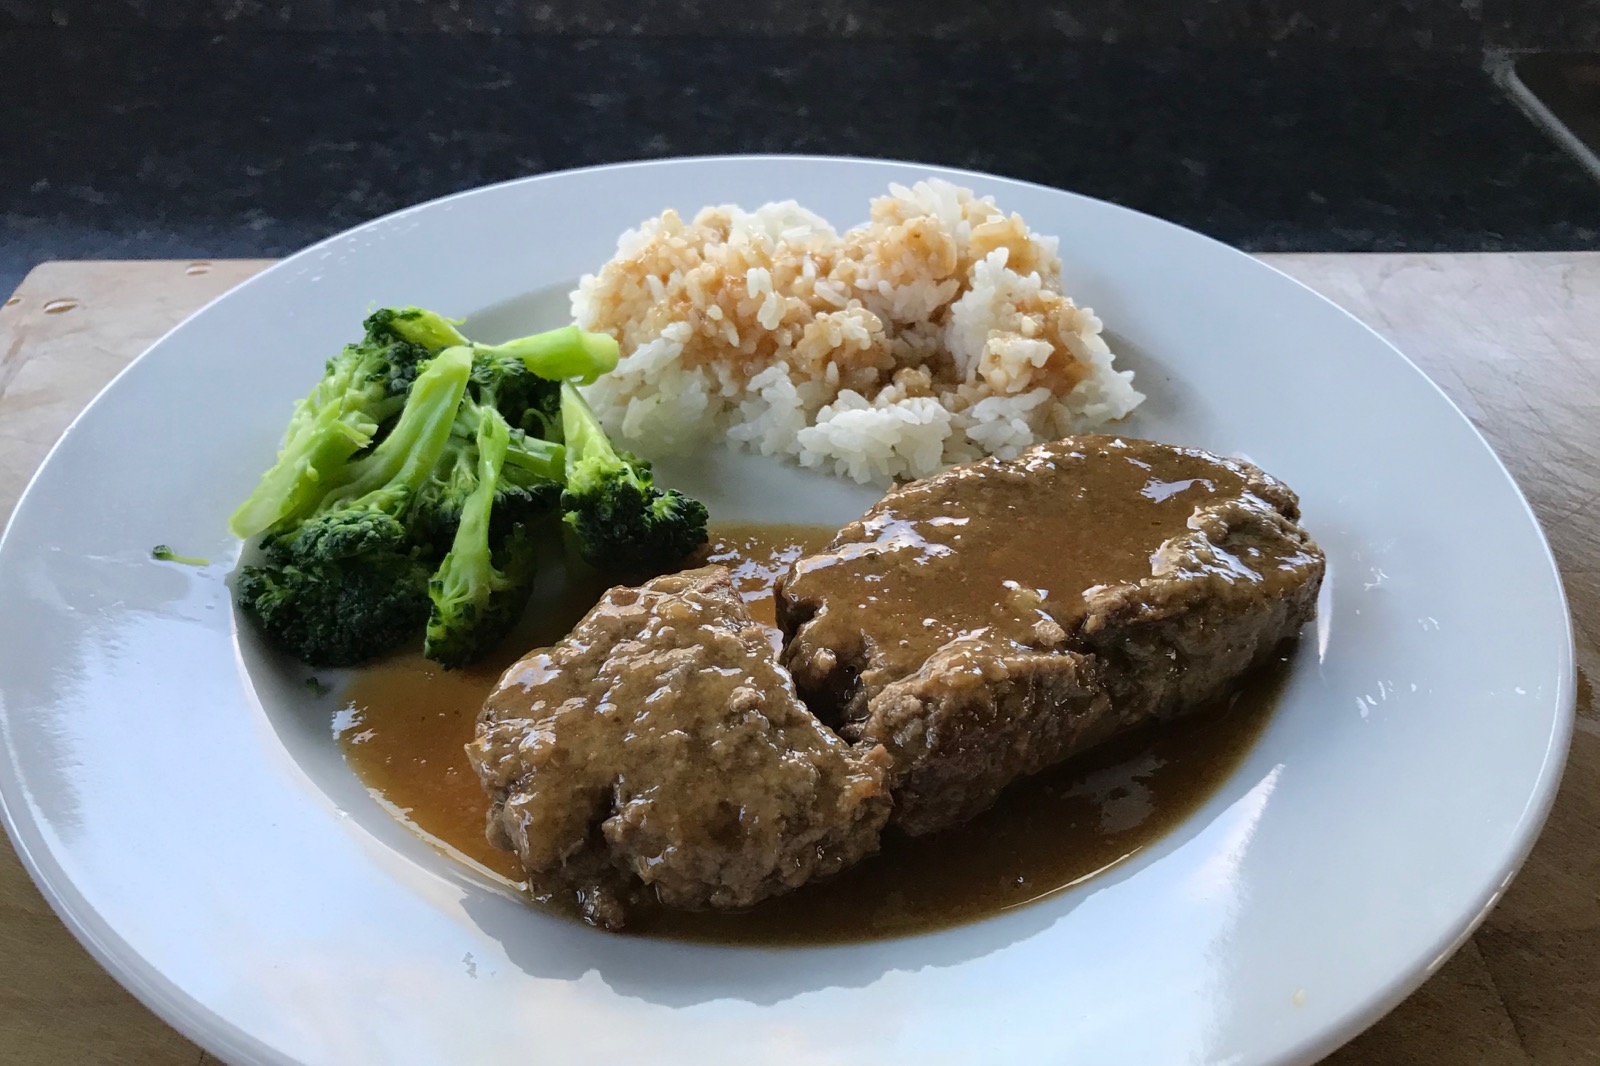 http://blog.rickk.com/food/2018/10/11/ate.2018.10.10.d.jpg